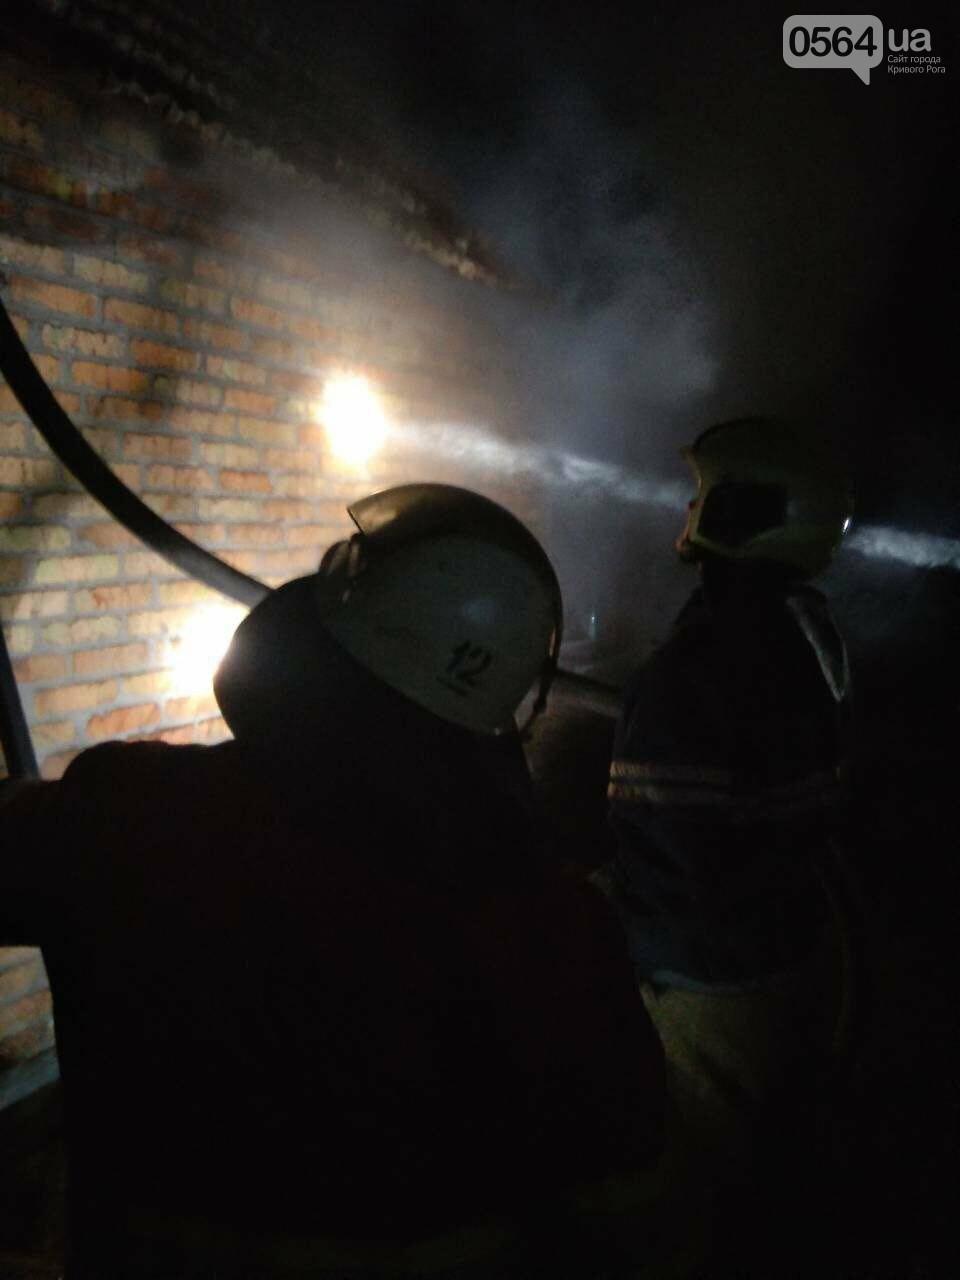 На пожаре в Кривом Роге пострадал пенсионер, - ФОТО , фото-3